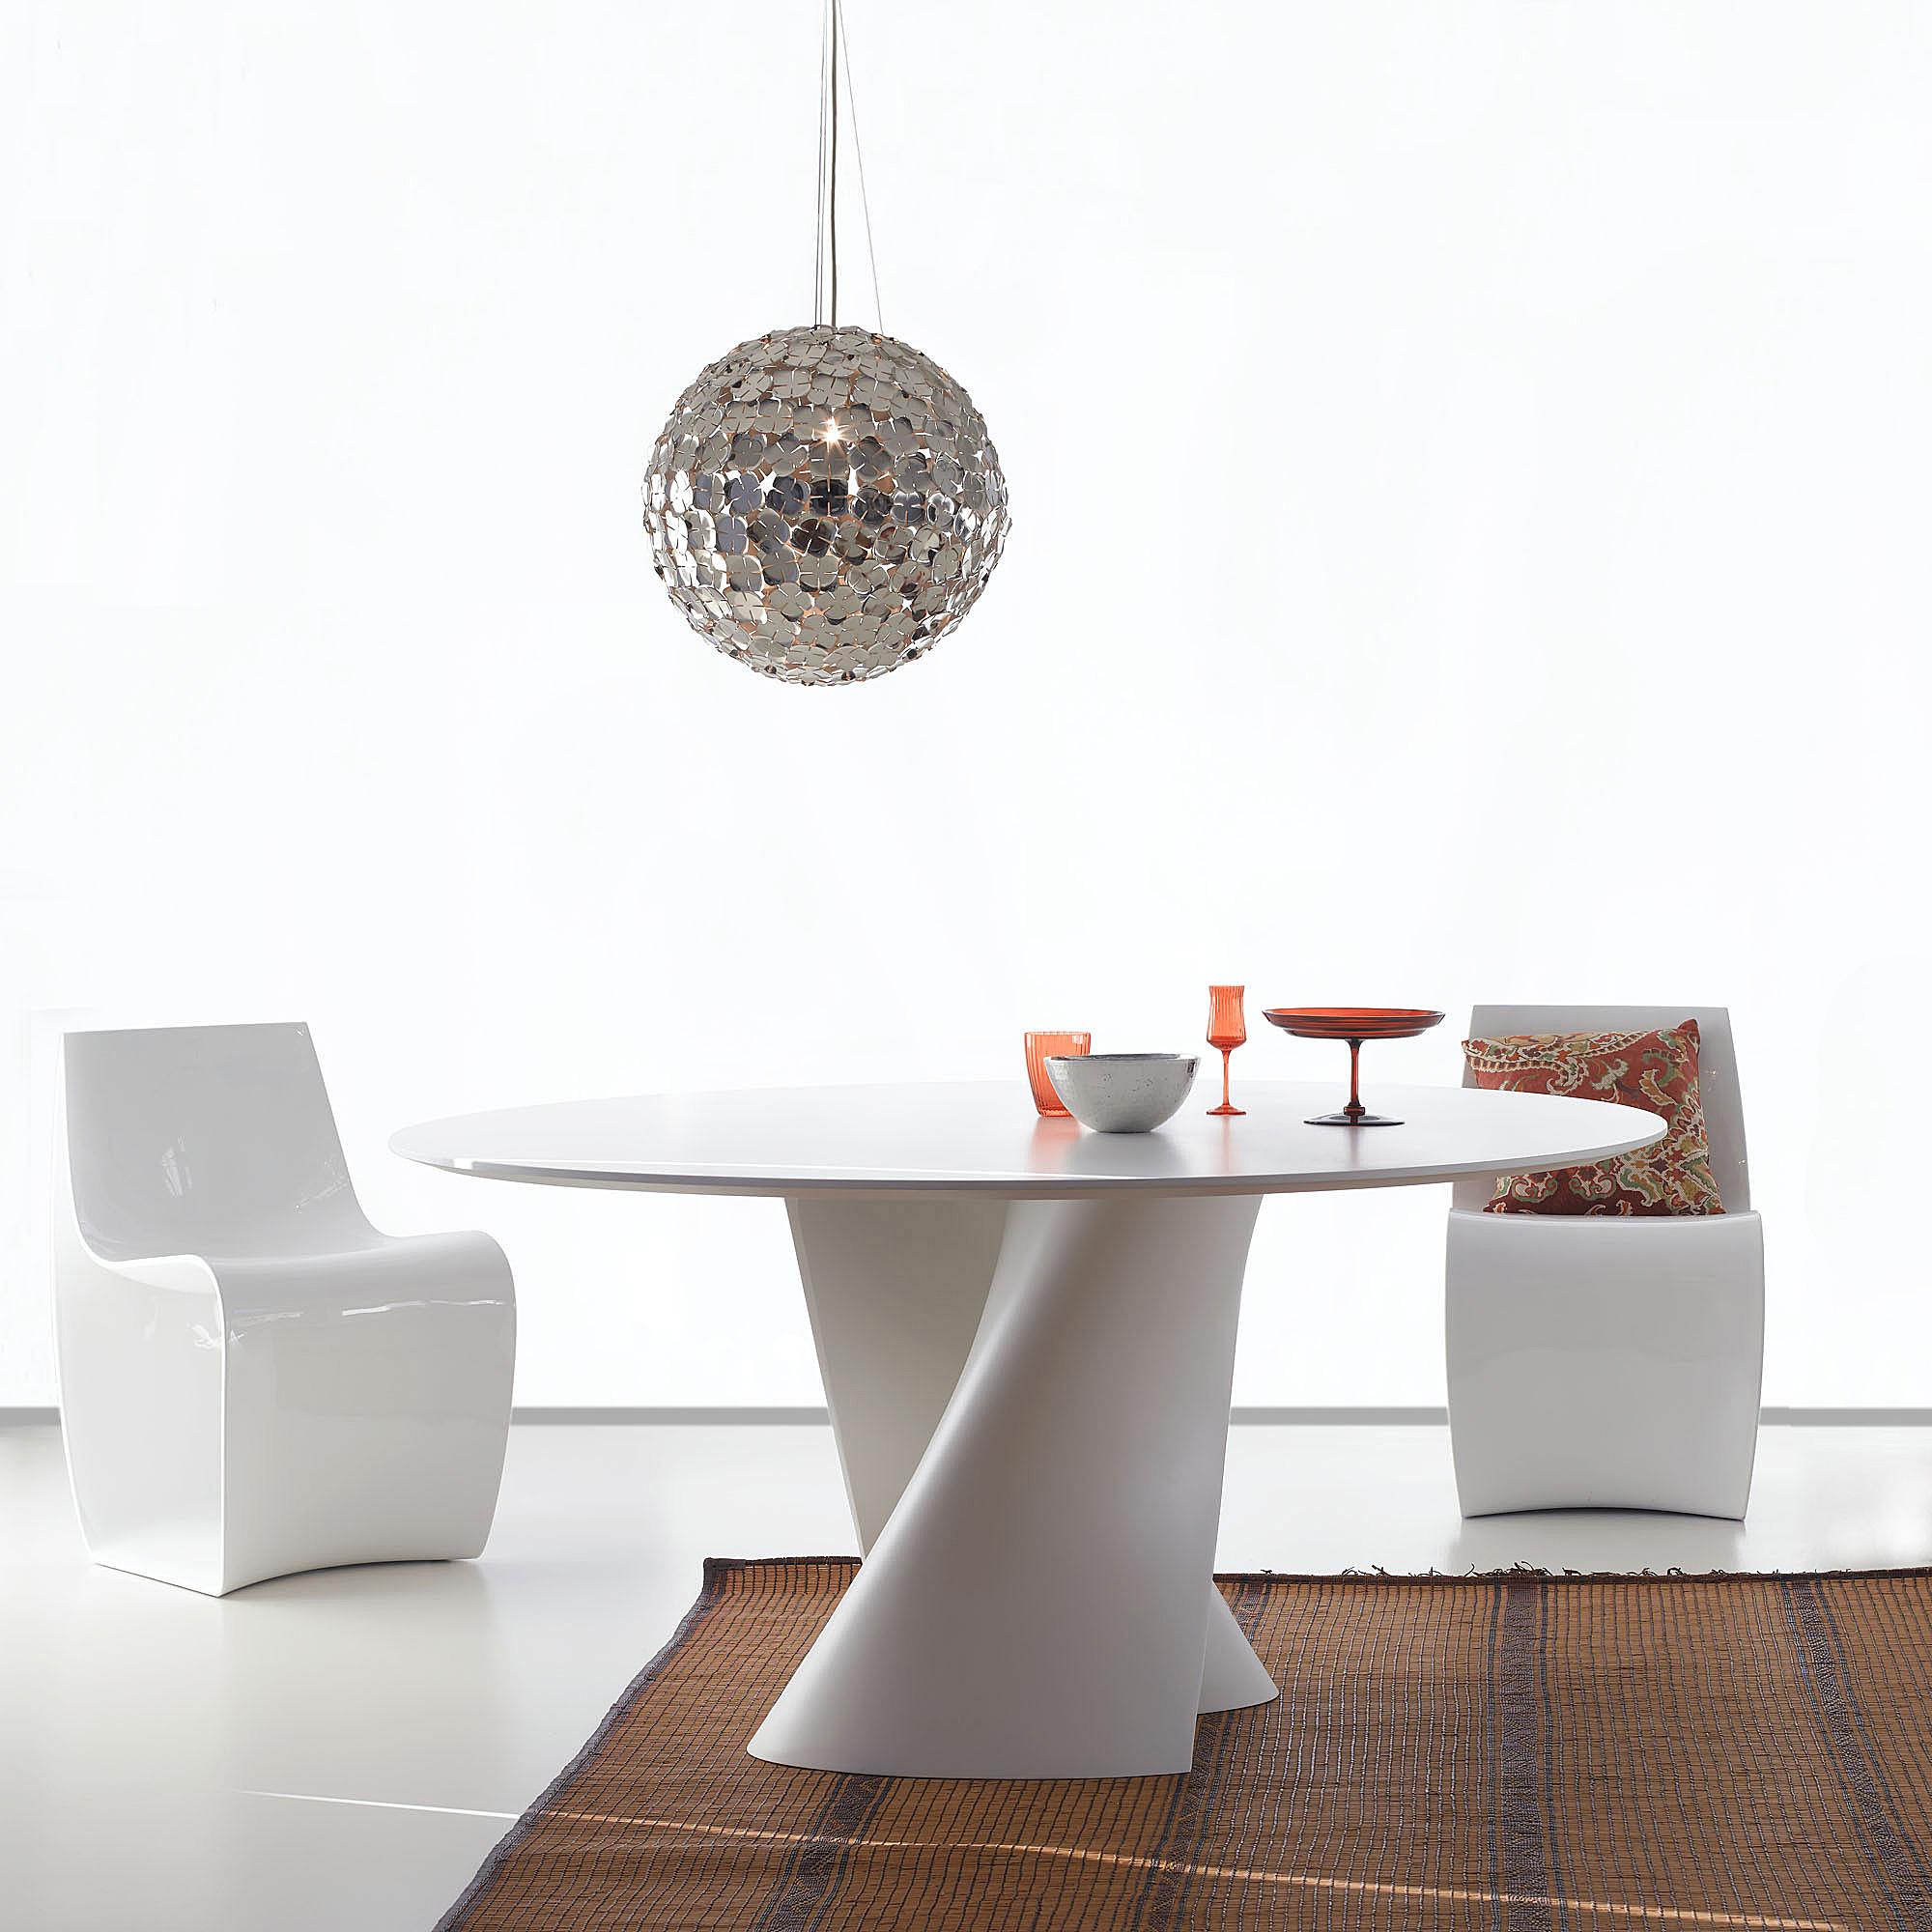 mdf italia s table tisch f042301p025d505s007 reuter onlineshop. Black Bedroom Furniture Sets. Home Design Ideas